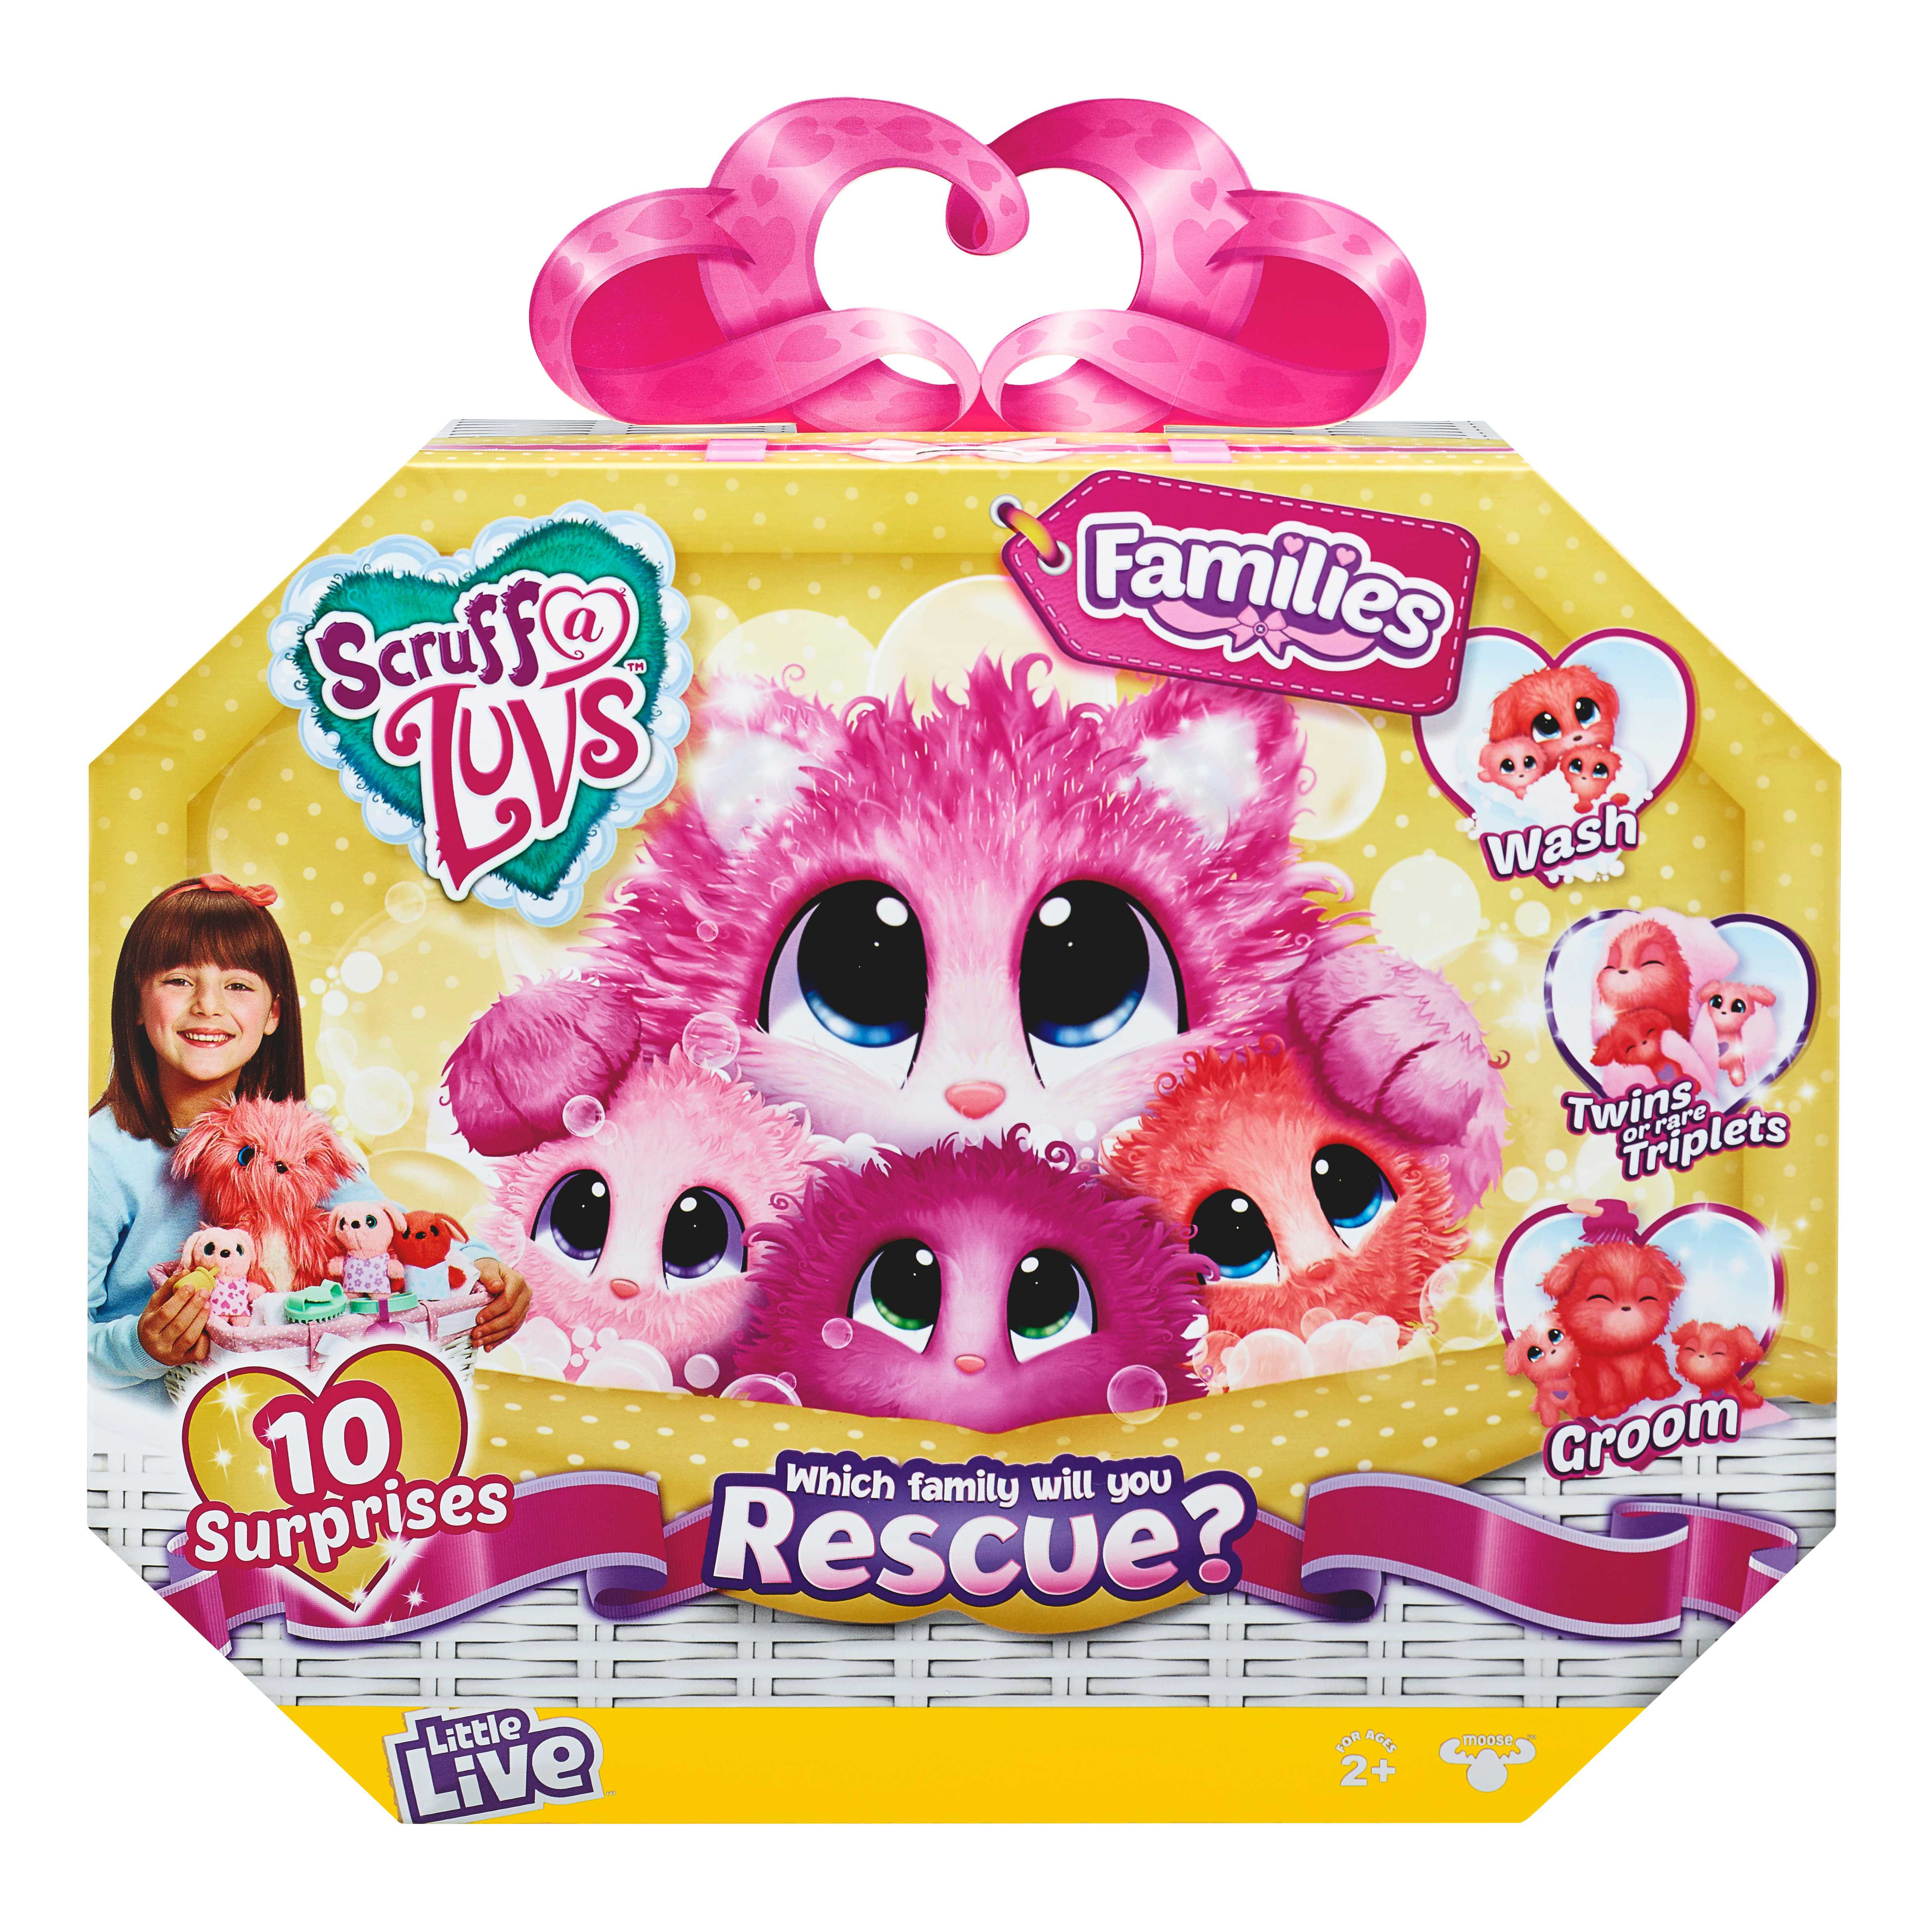 Little Live Scruff-a-Luvs plush mystery rescue pet  Rescue a whole family